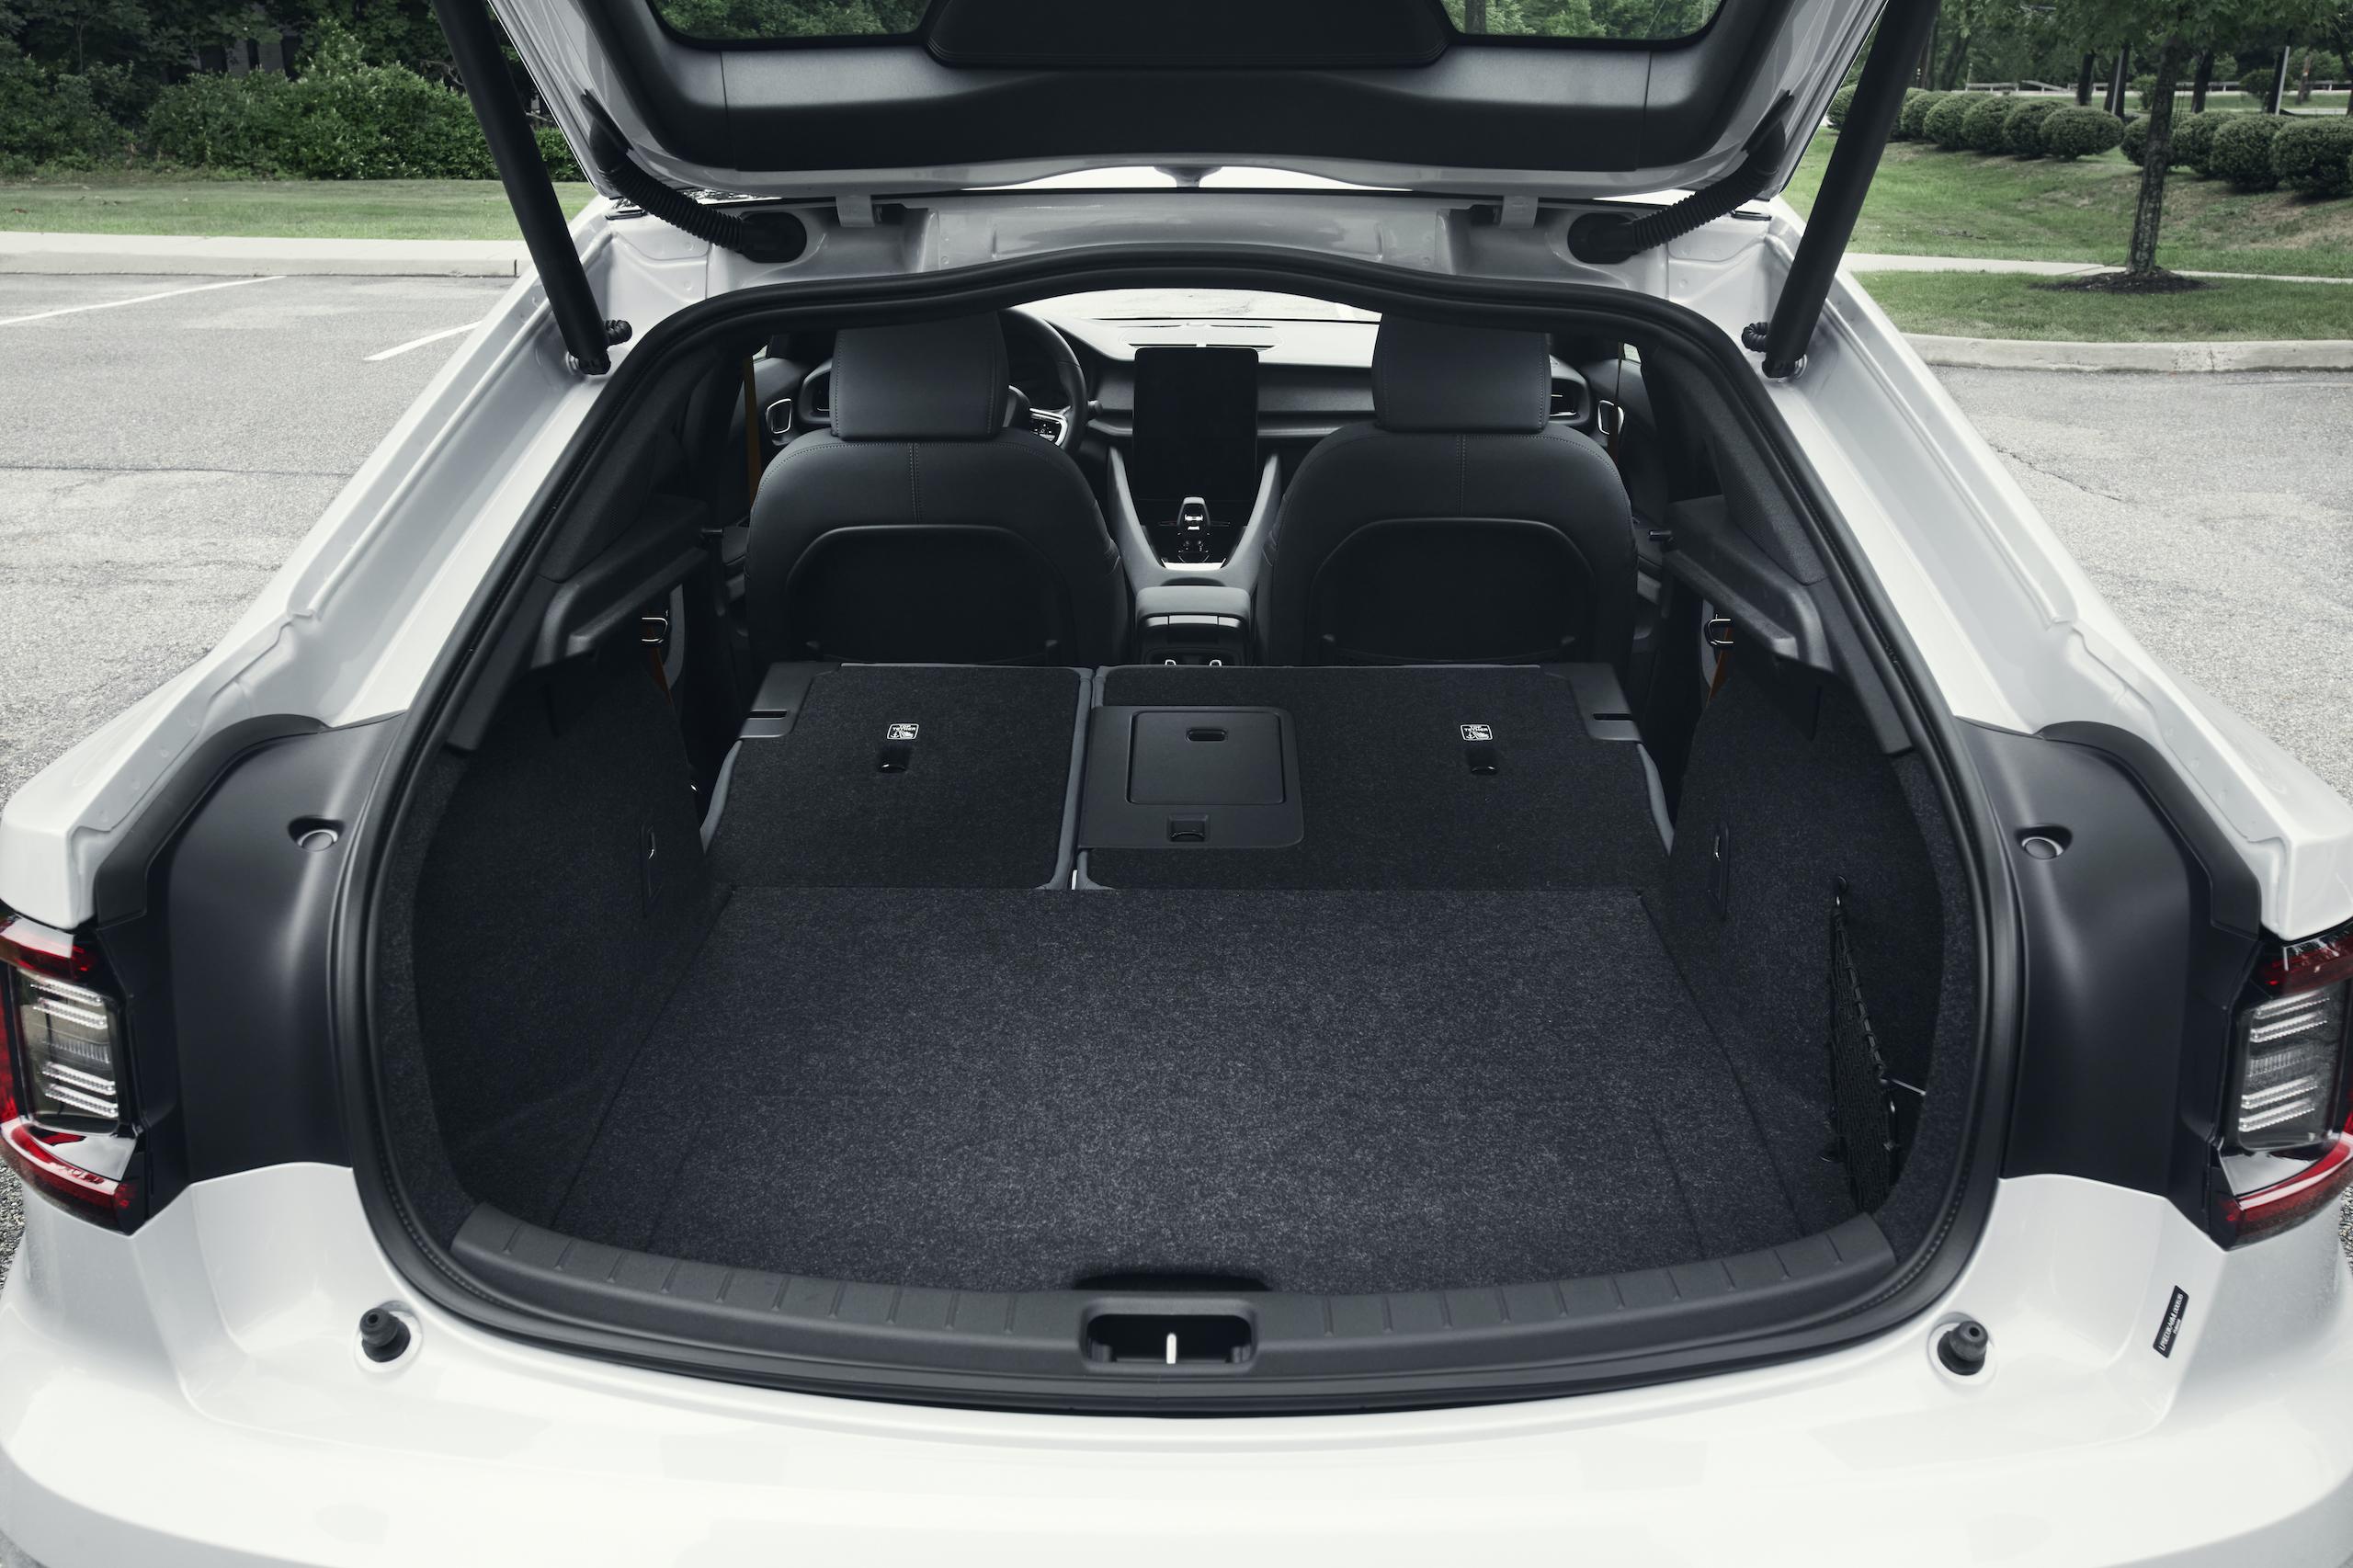 Polestar 2 rear trunk storage